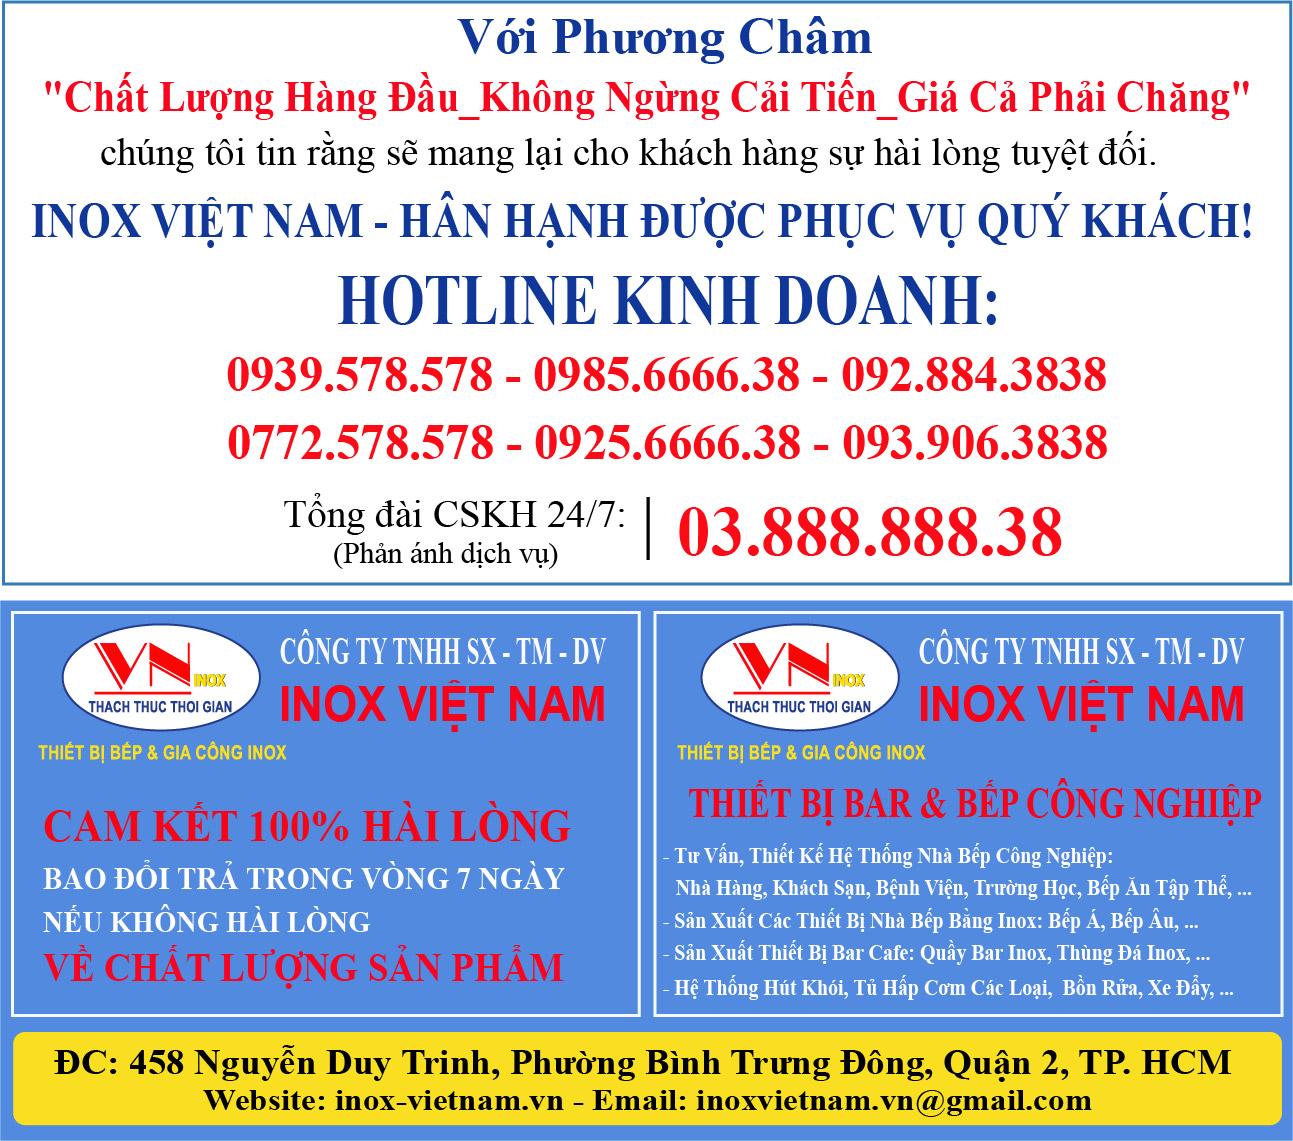 Inox-Viet-Nam-nha-cung-cap-chau-rua-inox-cong-nghiep